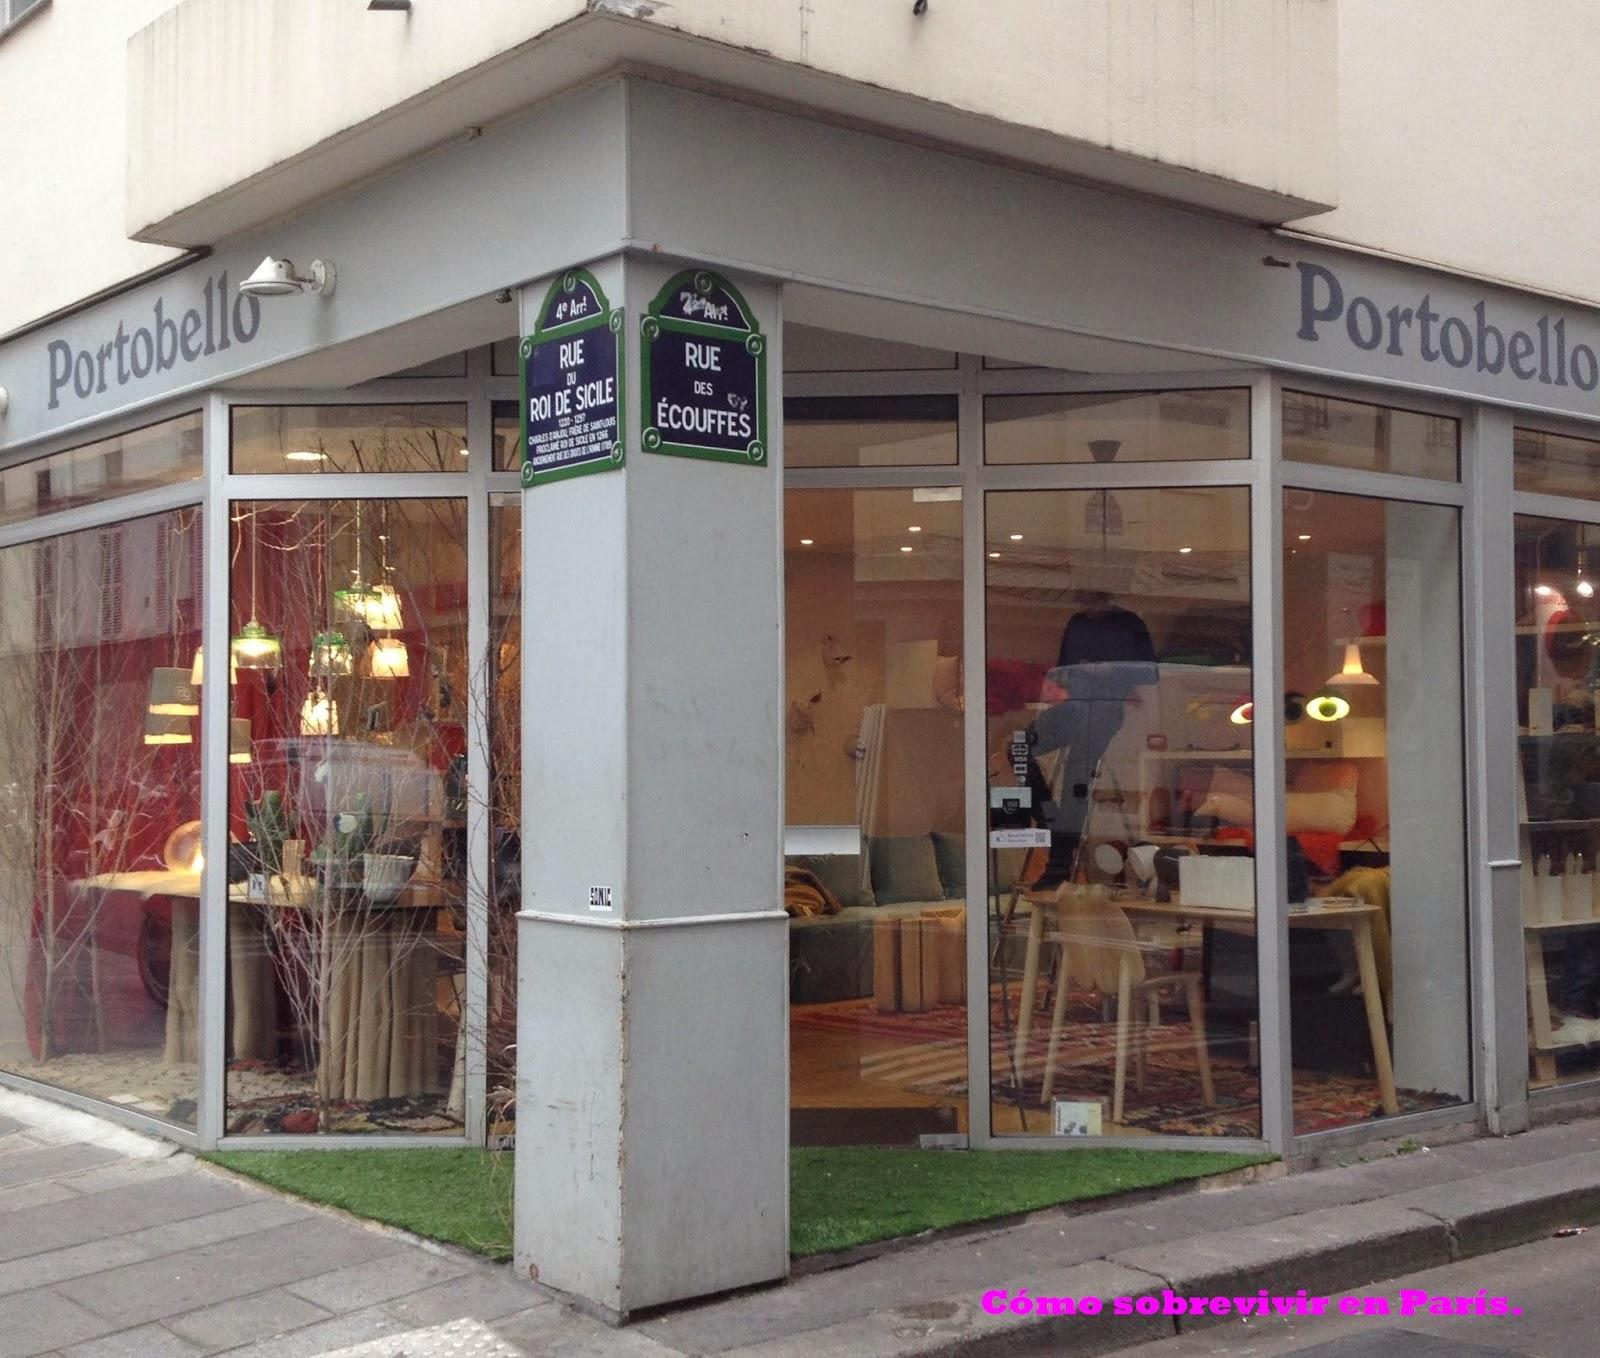 C mo sobrevivir en par s portobello tienda de decoraci n - Portobello decoracion ...